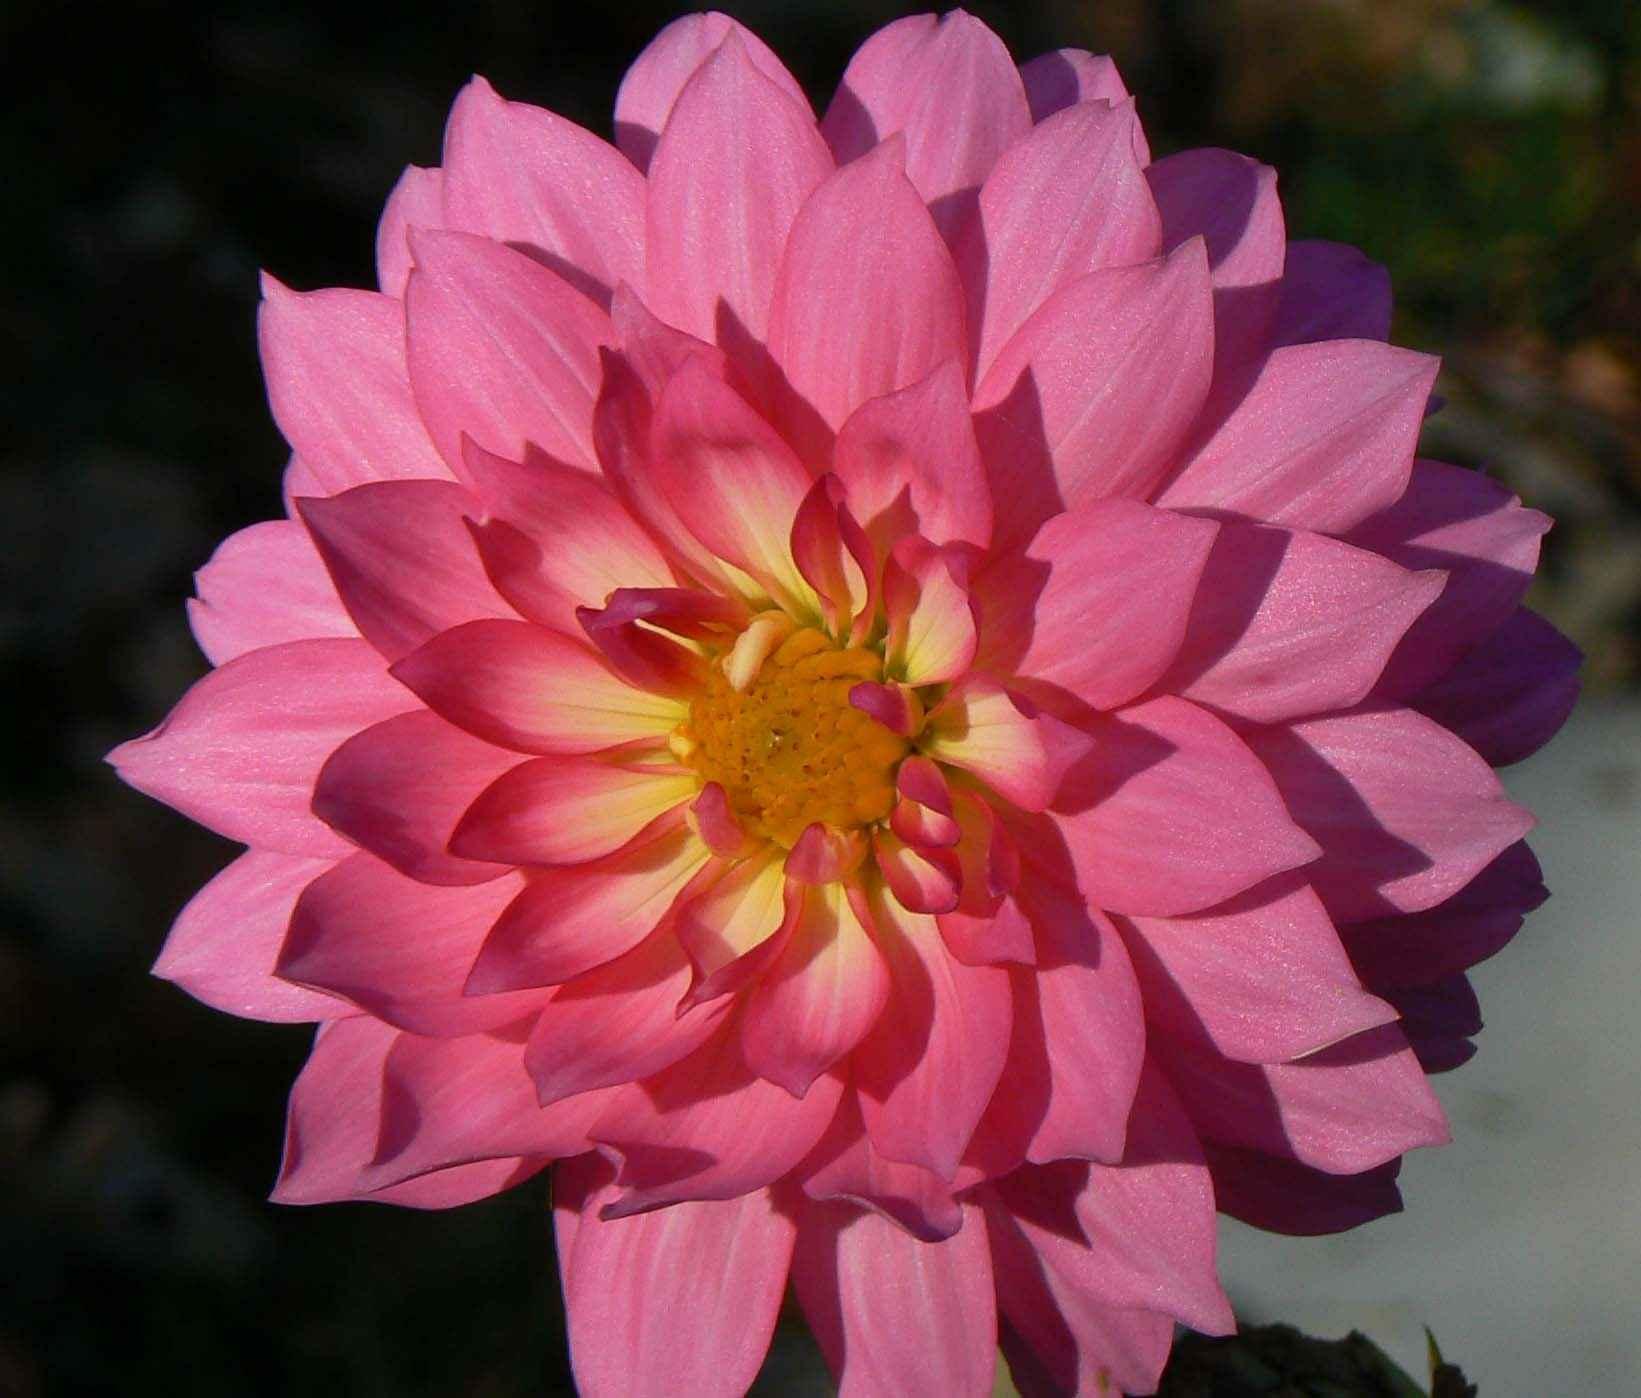 File:Dahlia flower petals pink dahlia.jpg - Wikimedia Commons